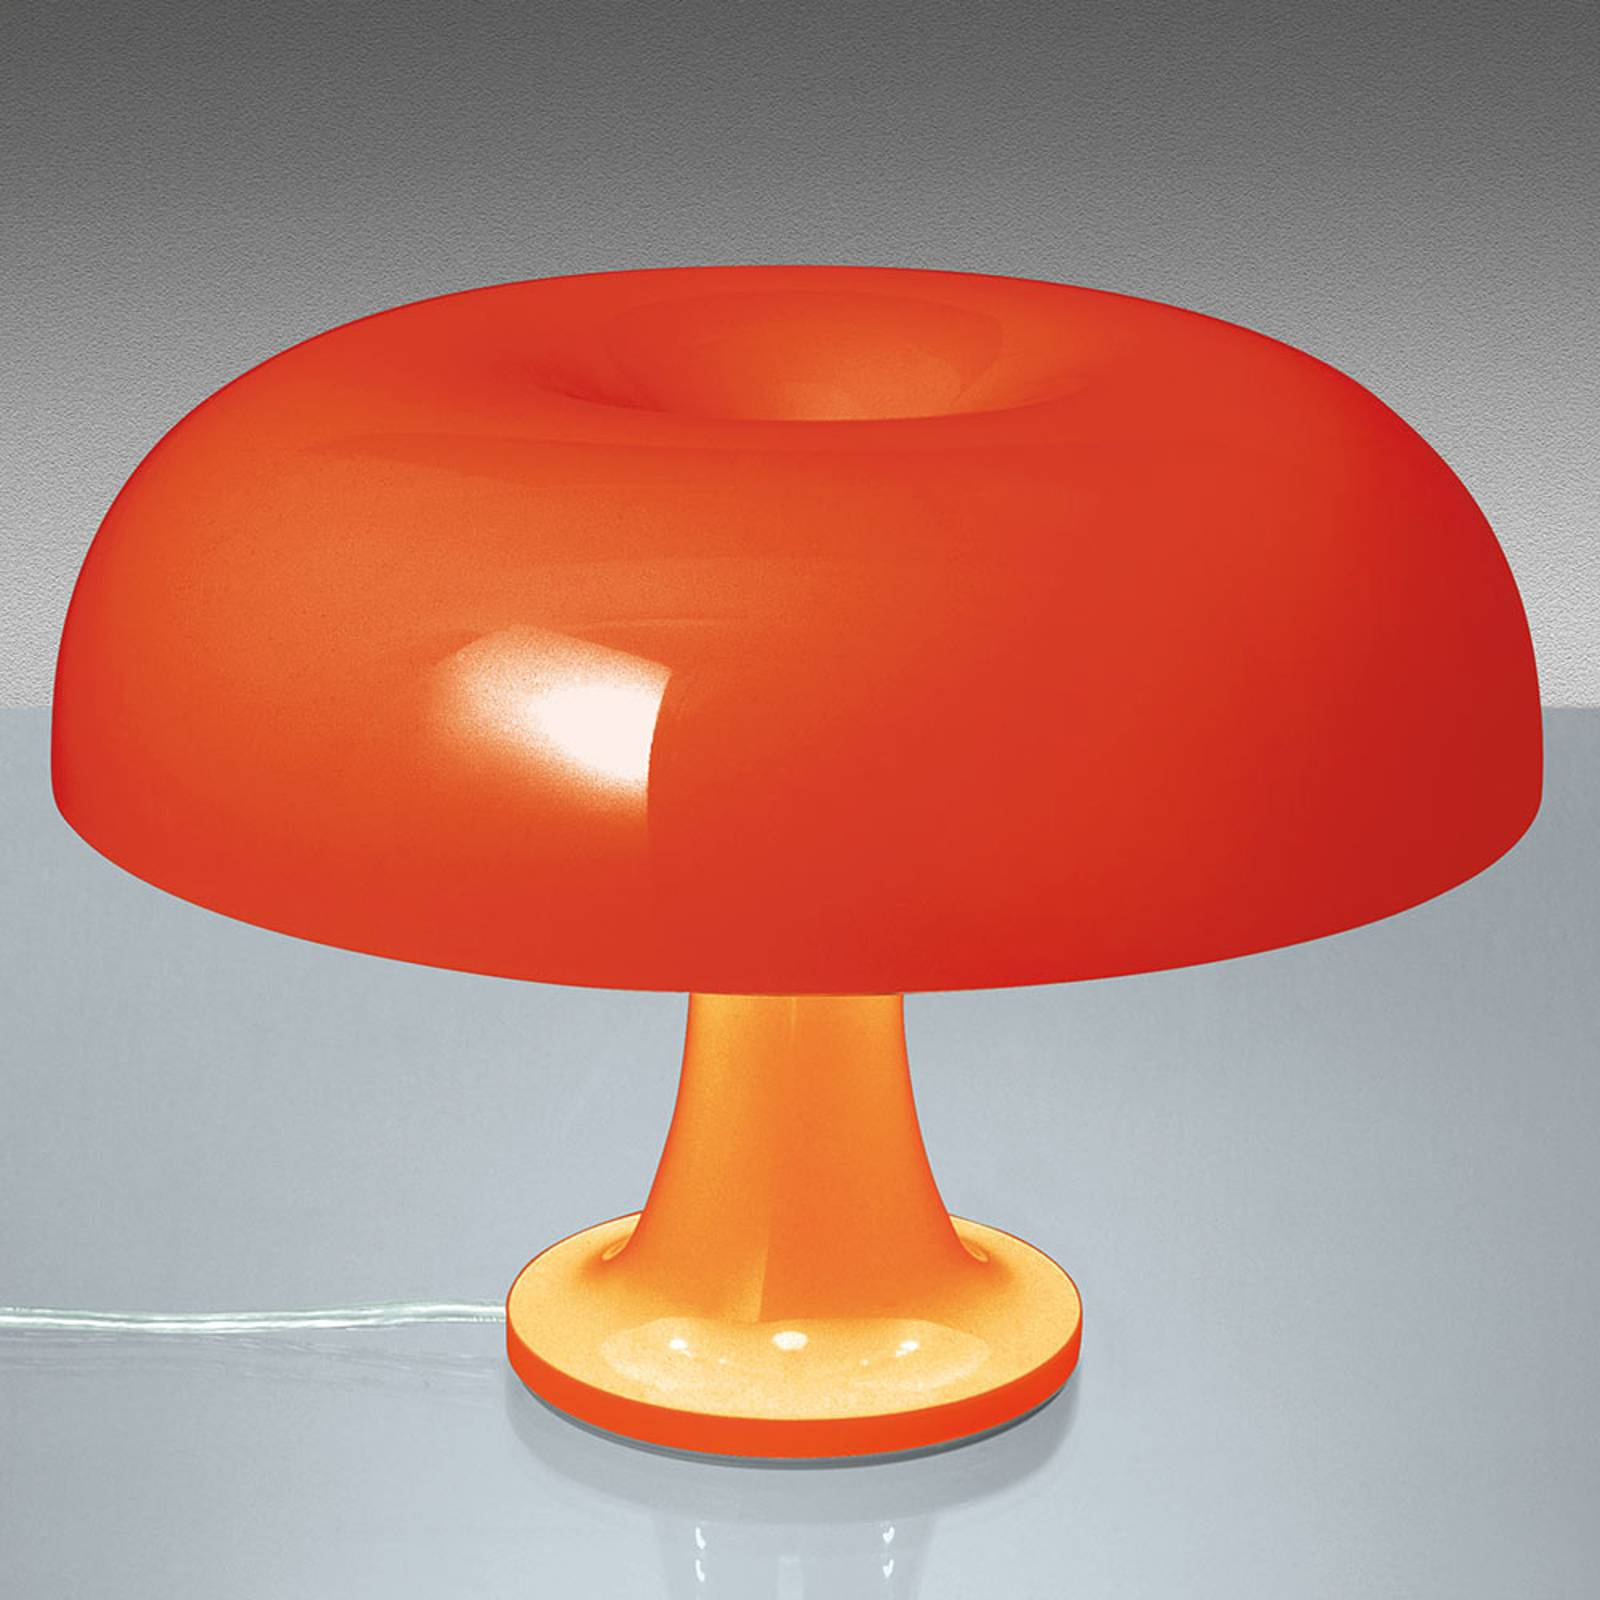 Artemide Nessino - Designer-Tischleuchte, orange